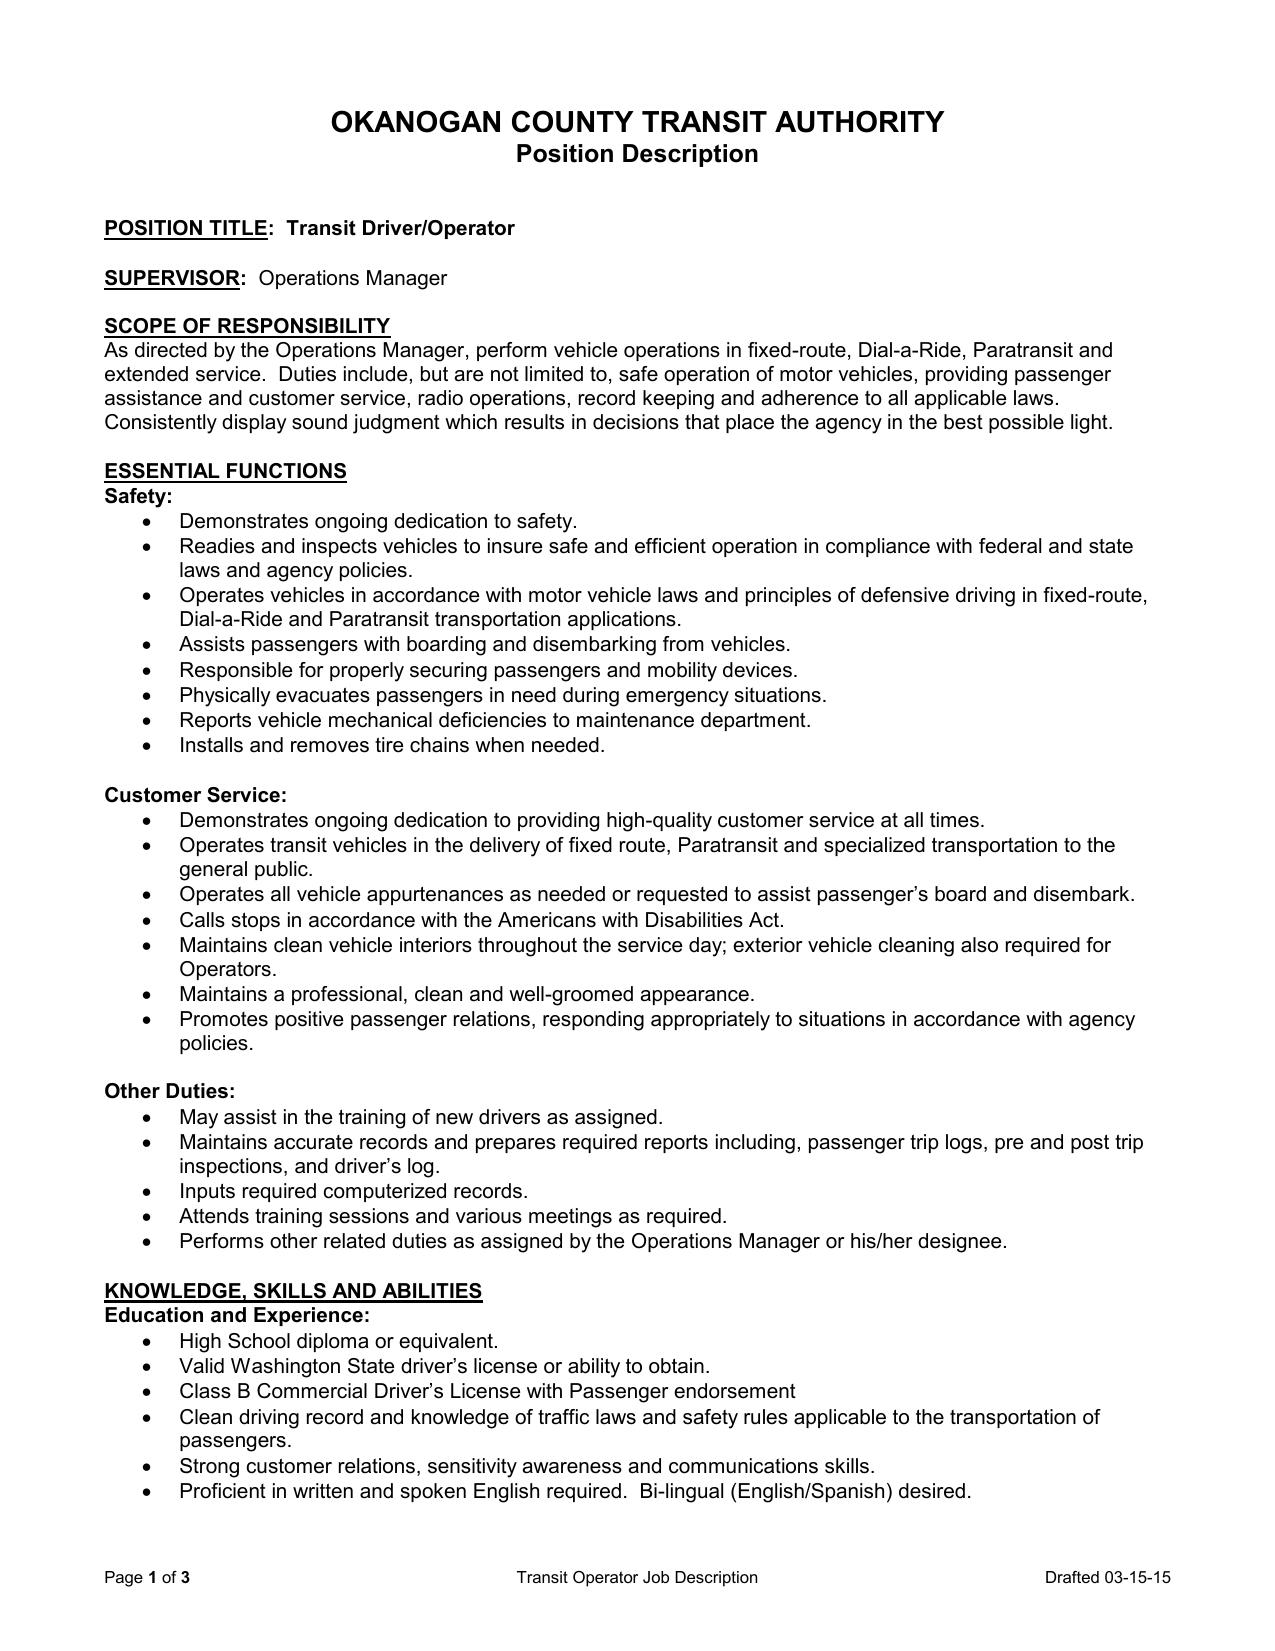 Transit Operator Job Description - Okanogan County Transit